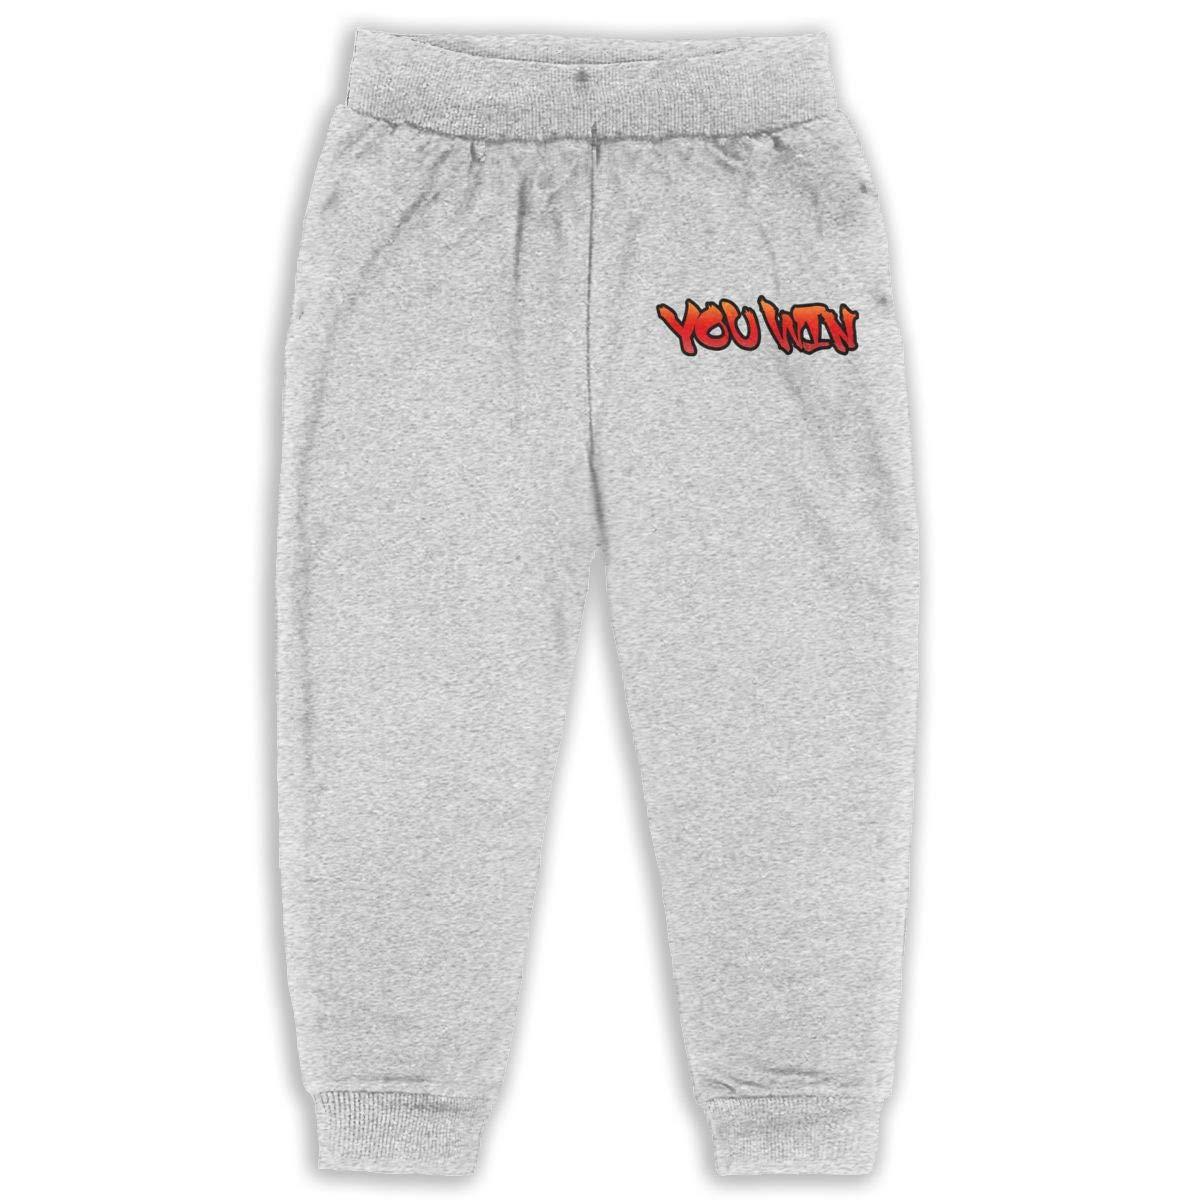 JOAPNWJ You Win Children Cartoon Cotton Sweatpants Sport Jogger Elastic Pants